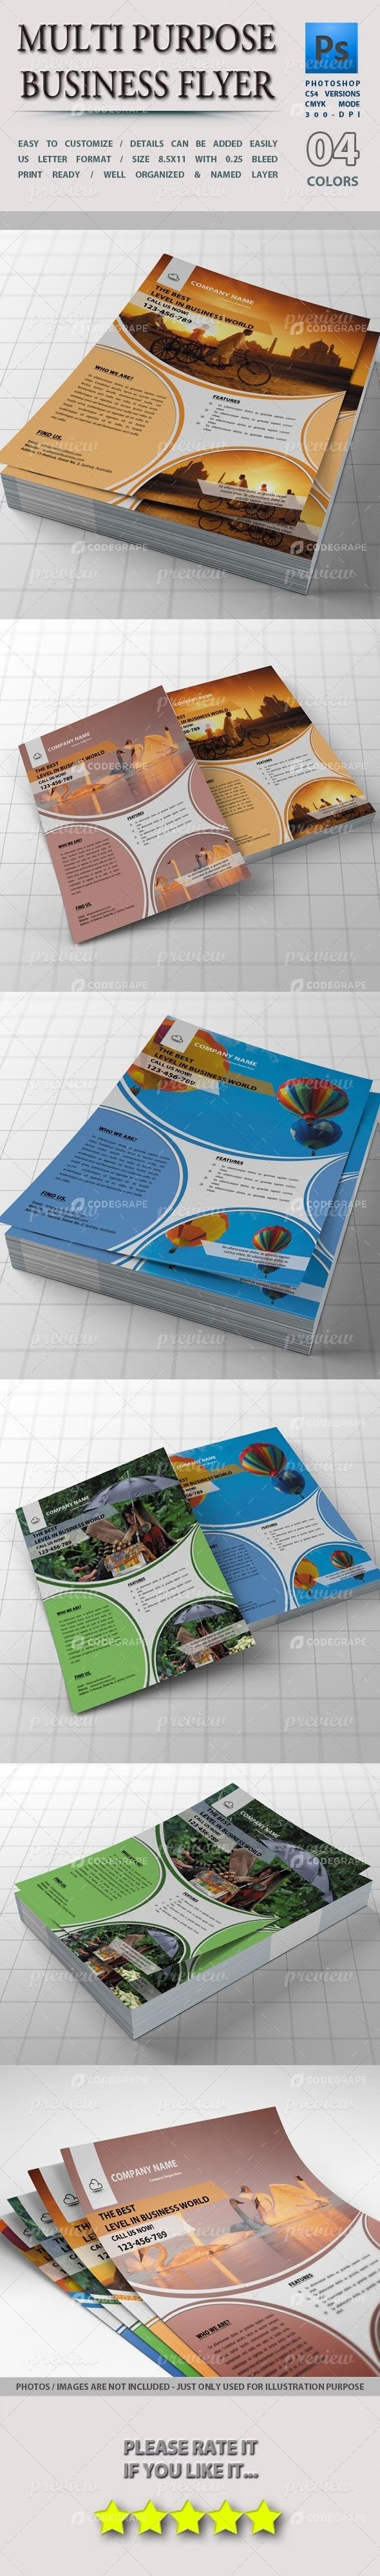 Multi-Purpose Business Flyer